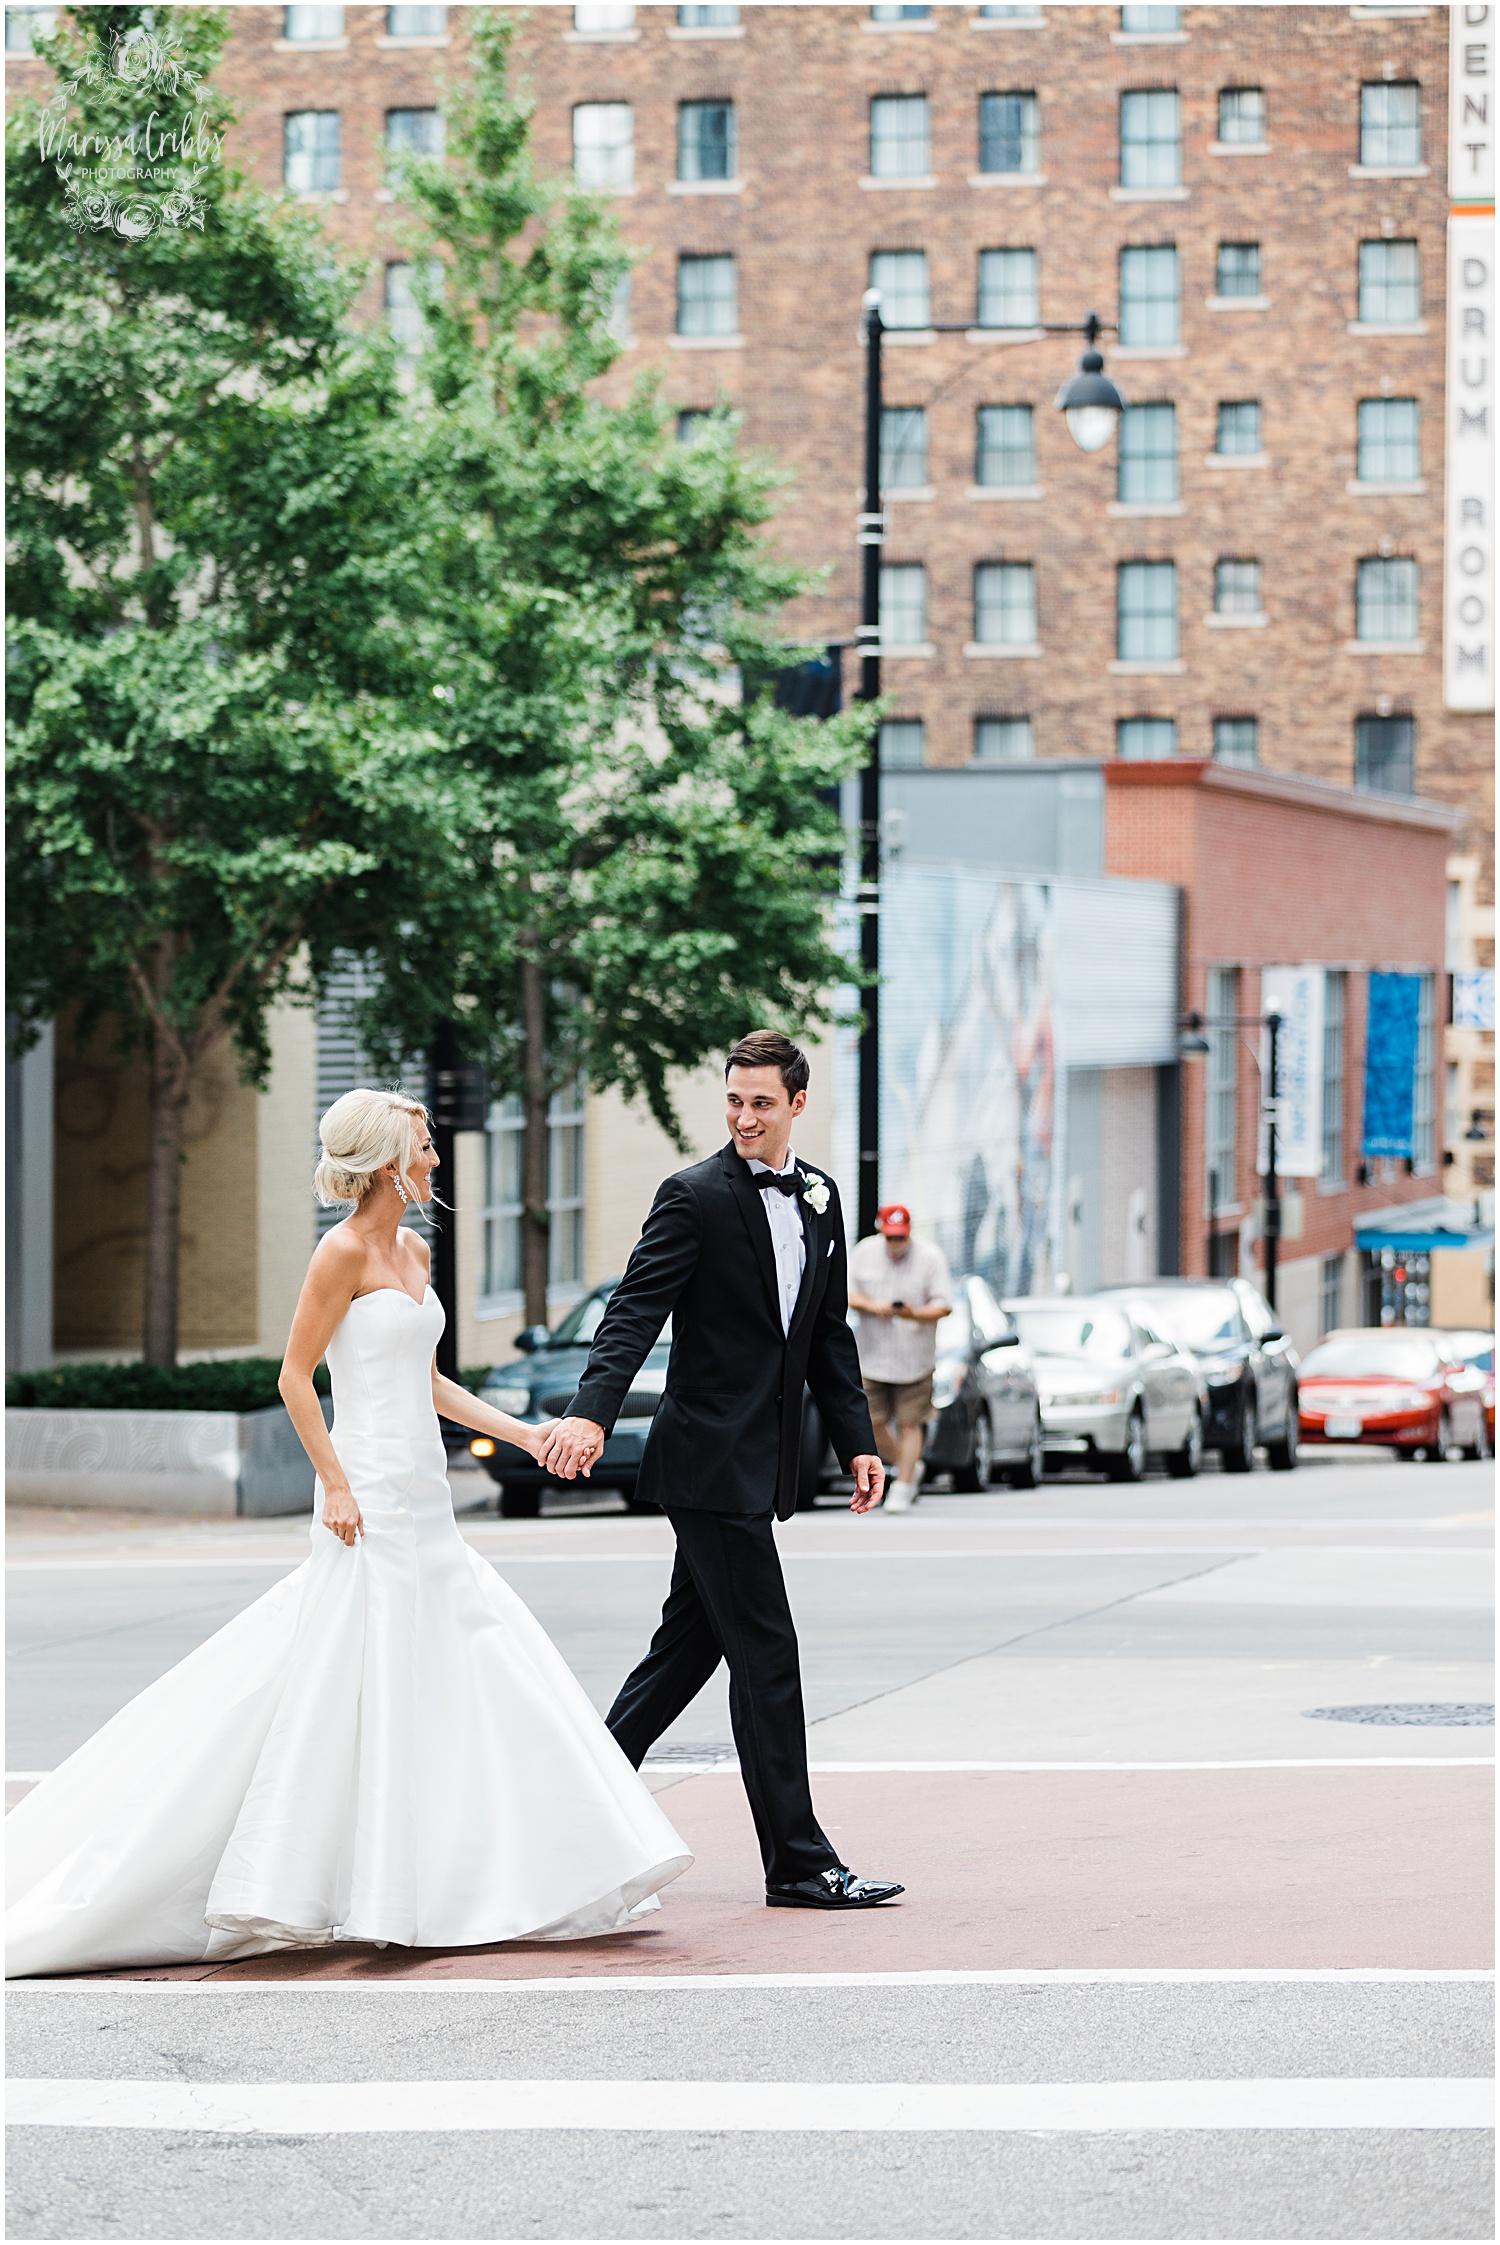 NOLL WEDDING | THE BRASS ON BALTIMORE | MARISSA CRIBBS PHOTOGRAPHY_6340.jpg